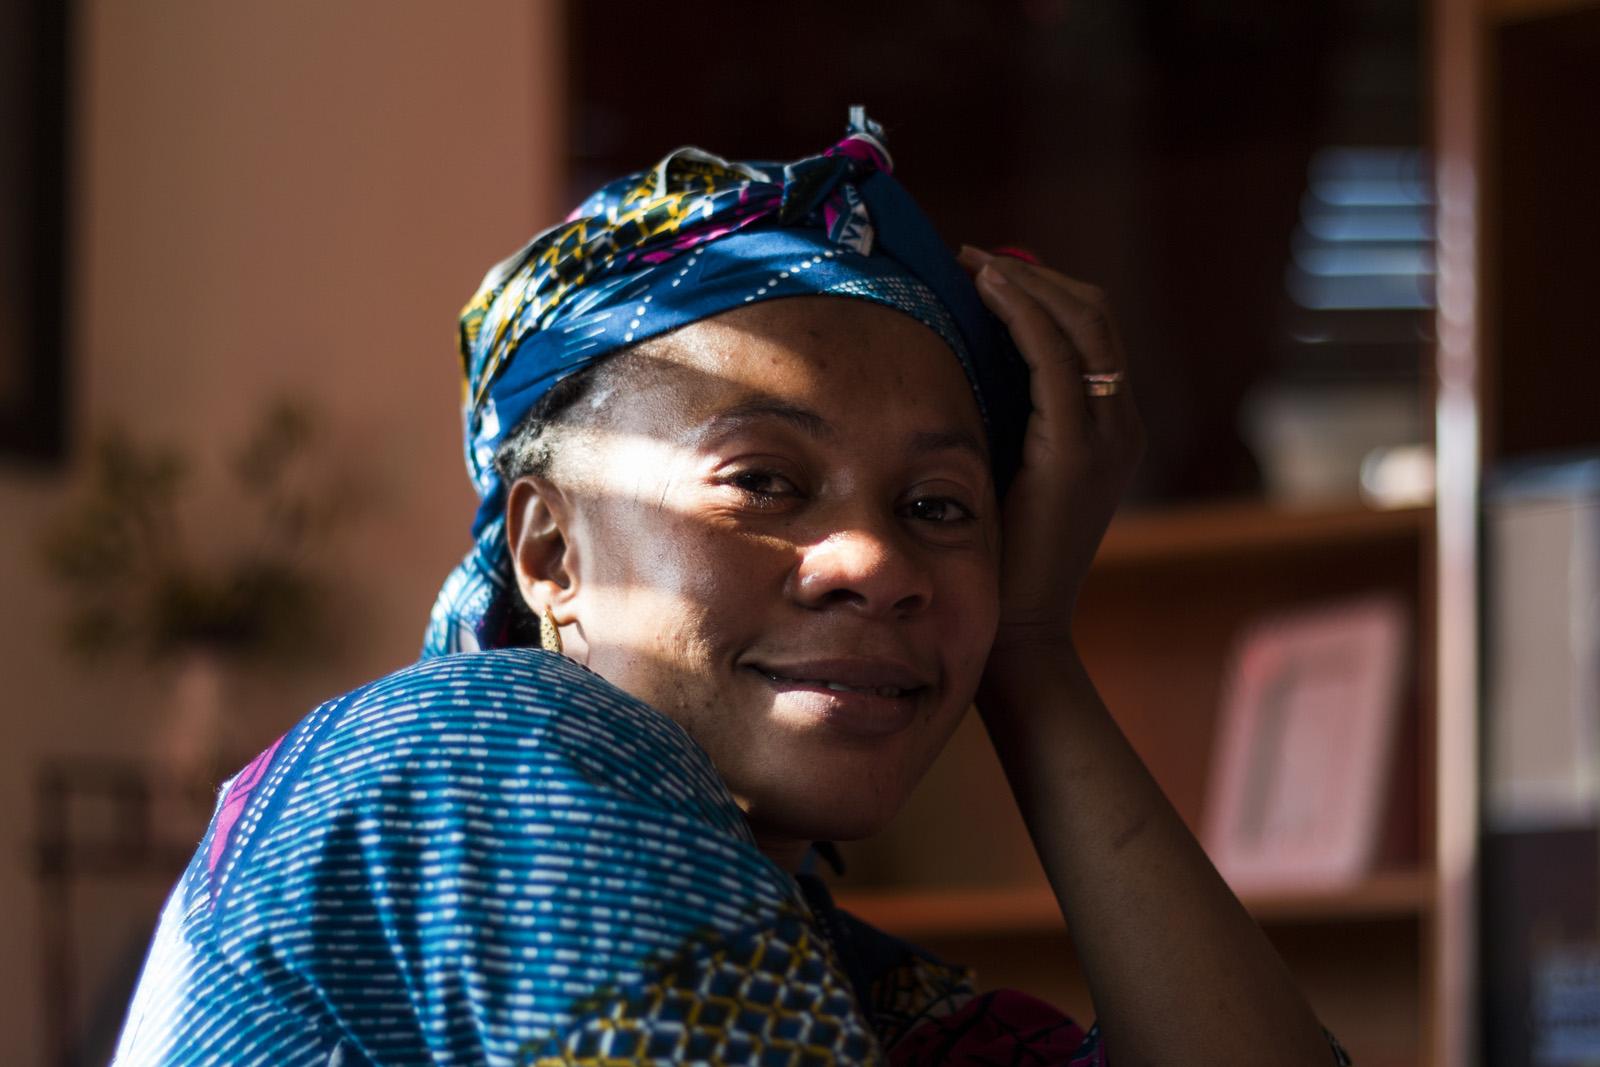 Retrato Mujer Africana